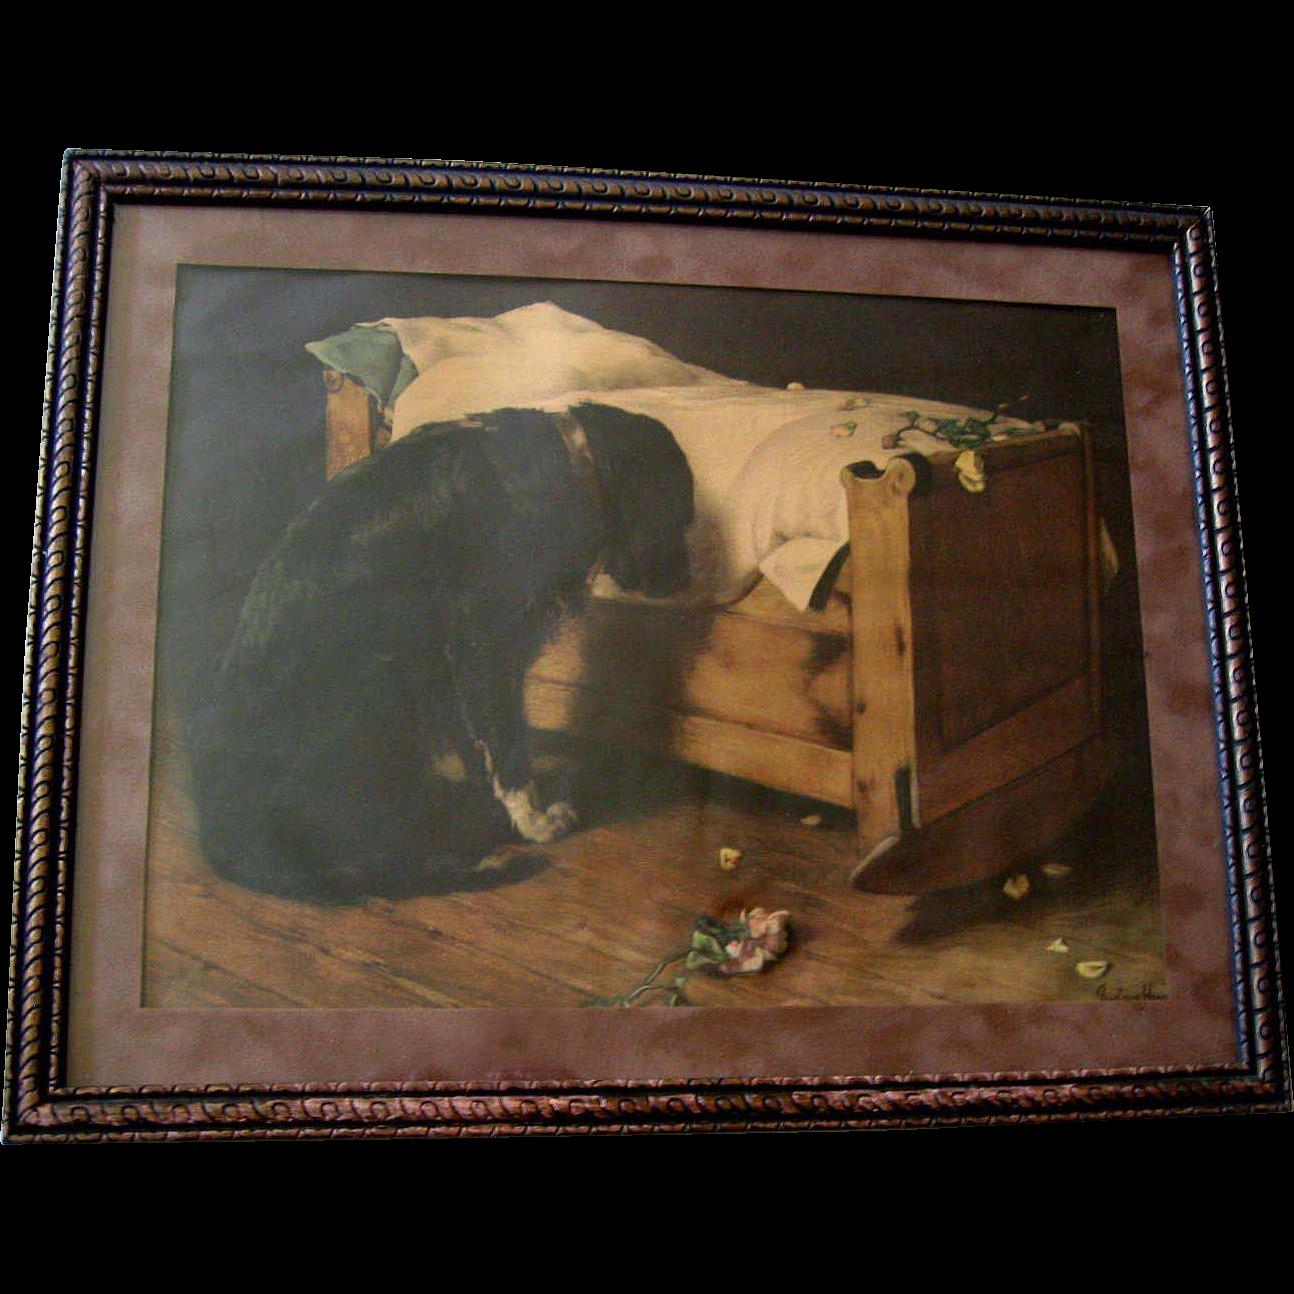 c1902 The Lost Playmate Print Deceased Child Black Labrador Dog Roses Cradle Crib